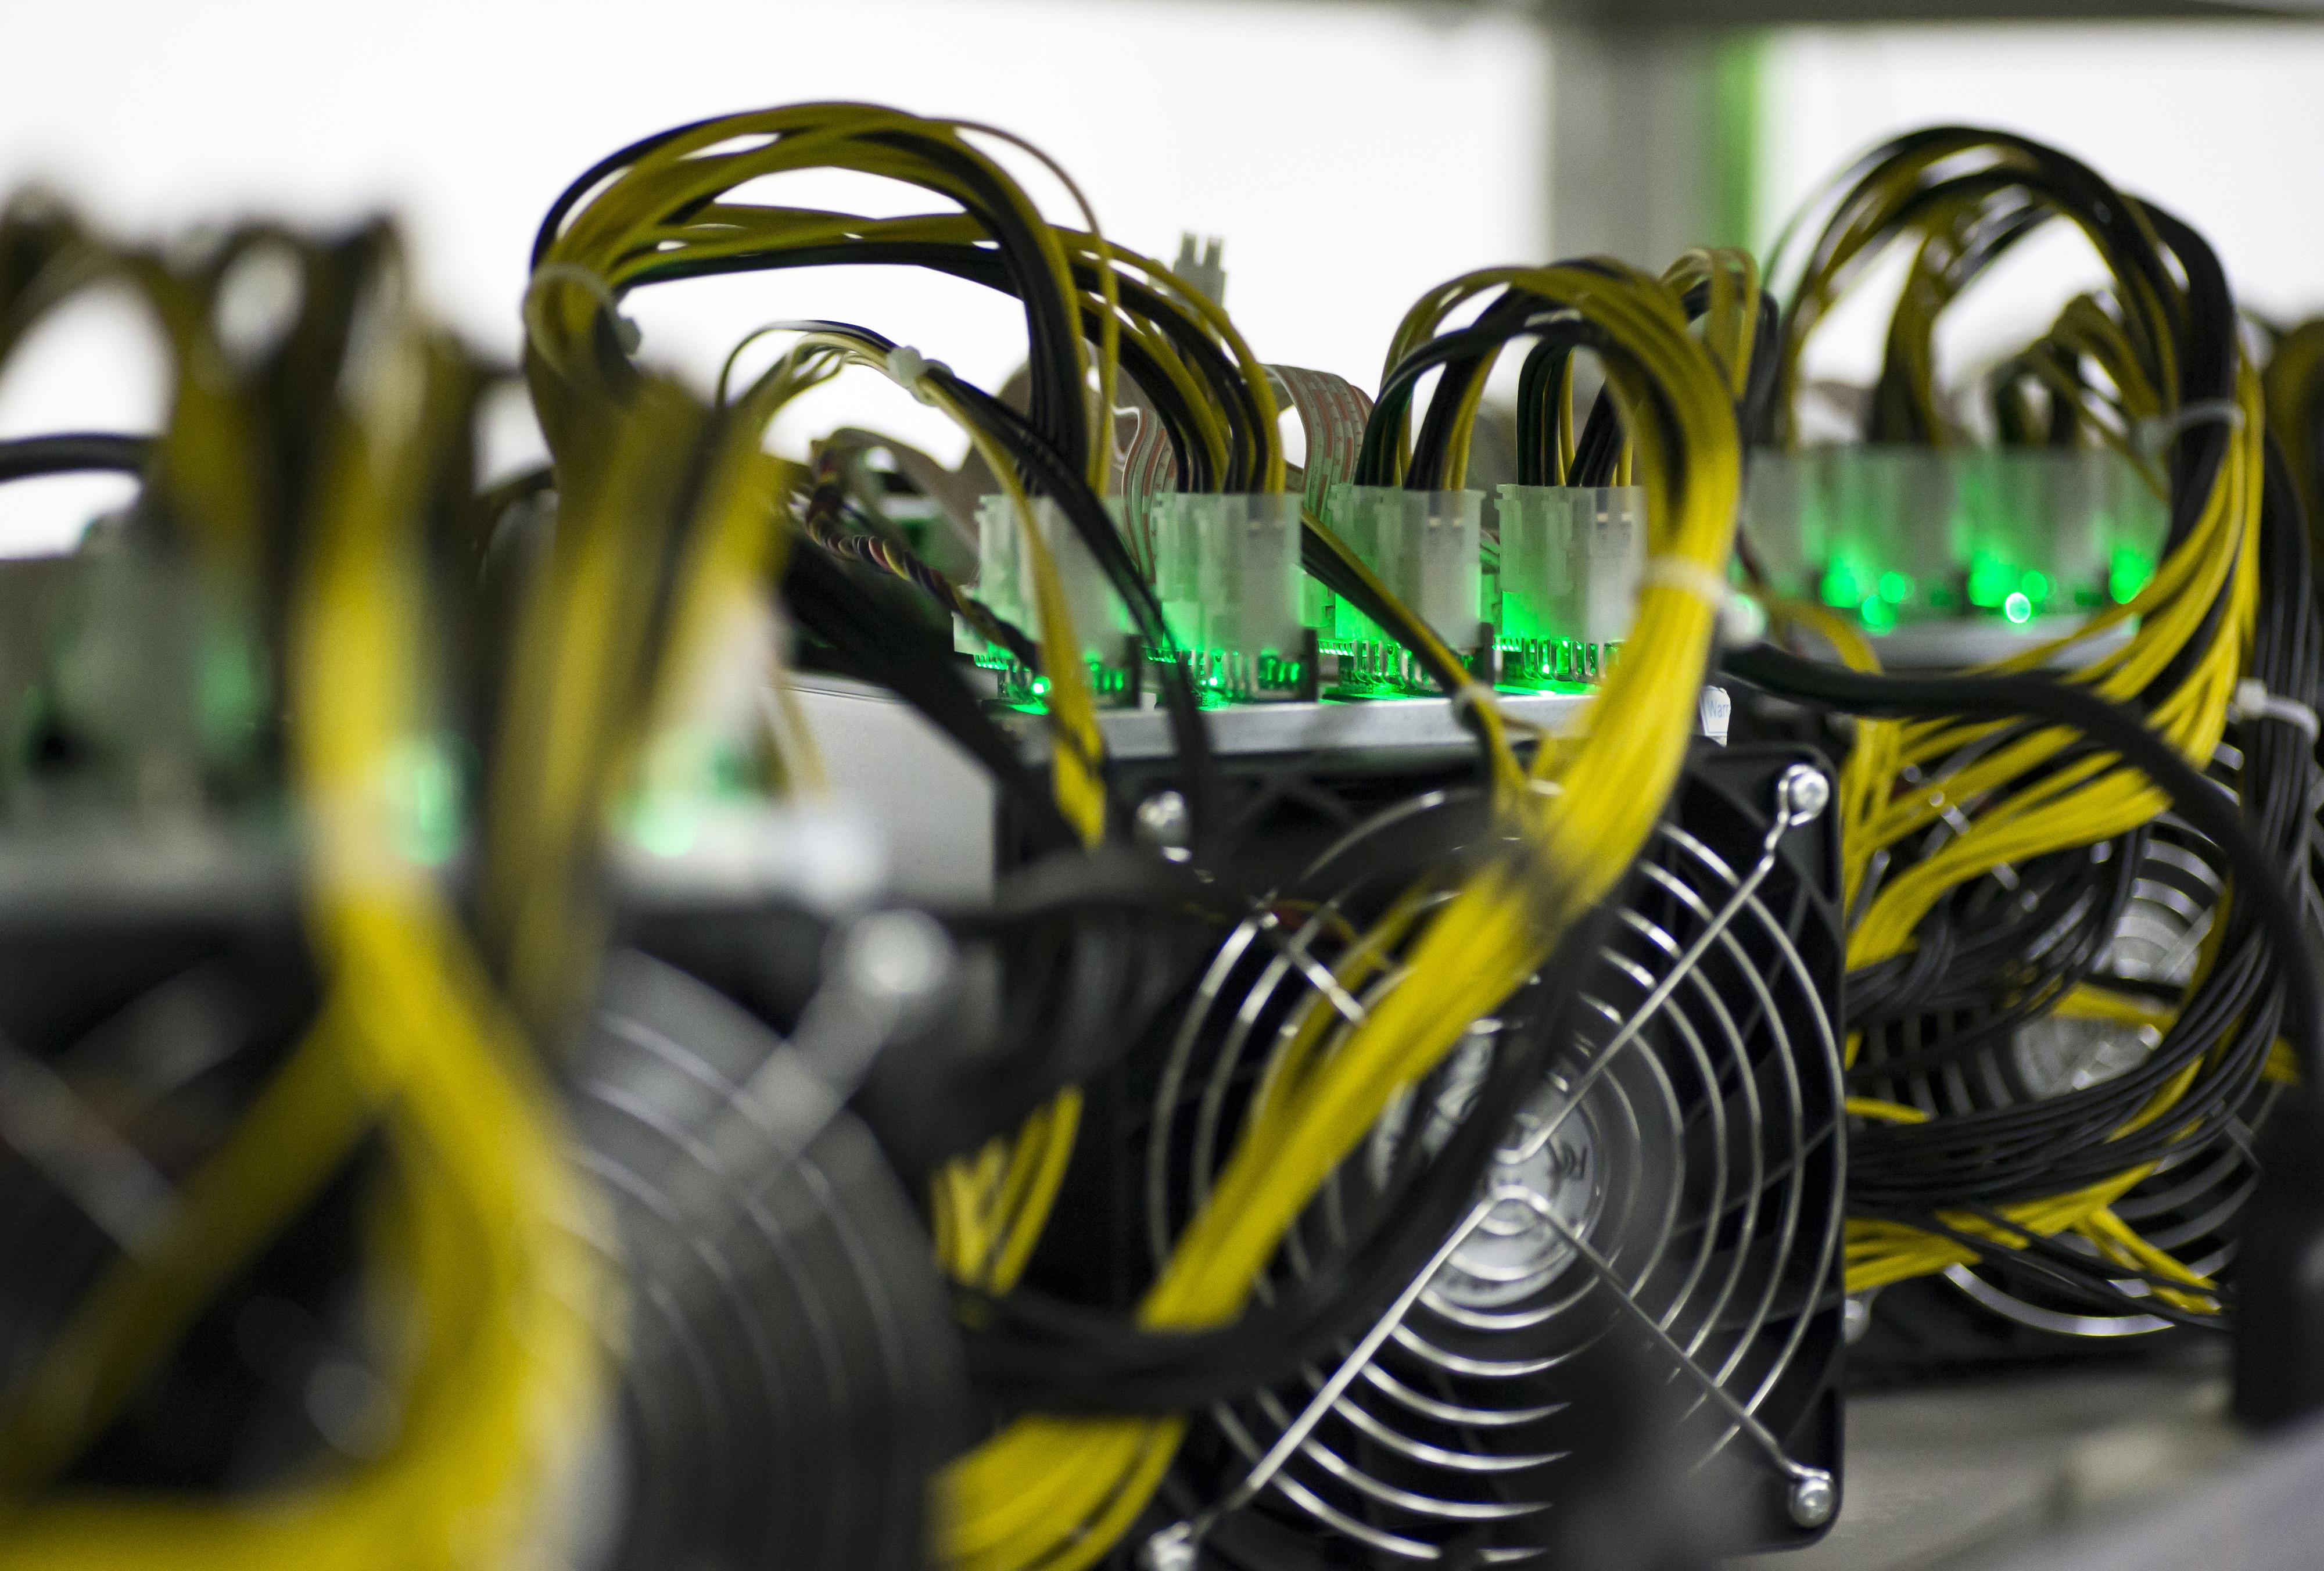 https://assets.sourcemedia.com/da/76/f0d38a3143959576e81baae6f1cb/di-blockchain-computing-stock-071318-1.jpg